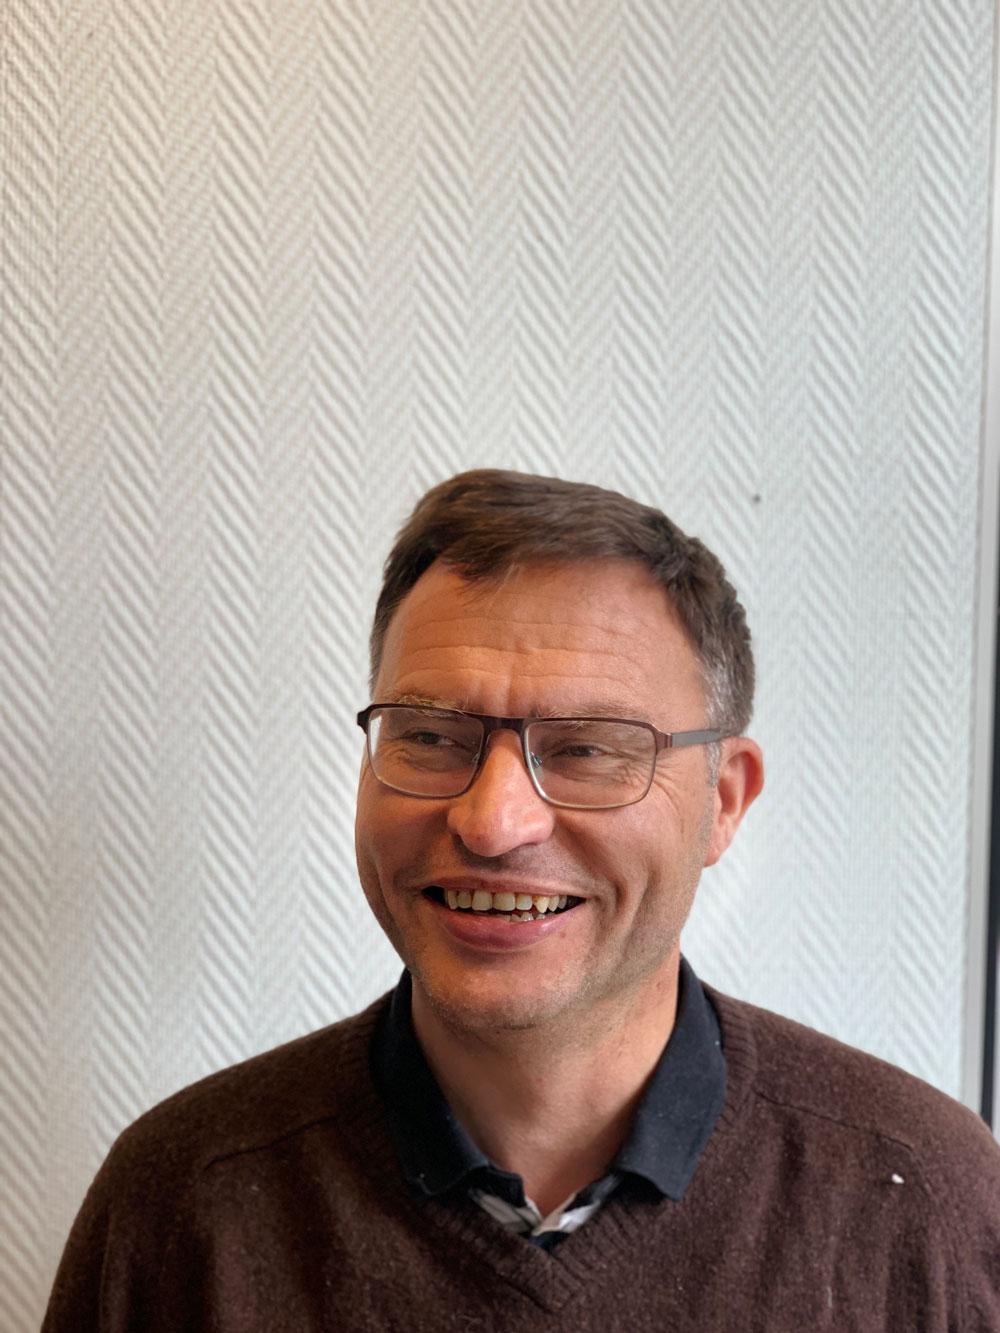 Sverre Kristian Ulvestad